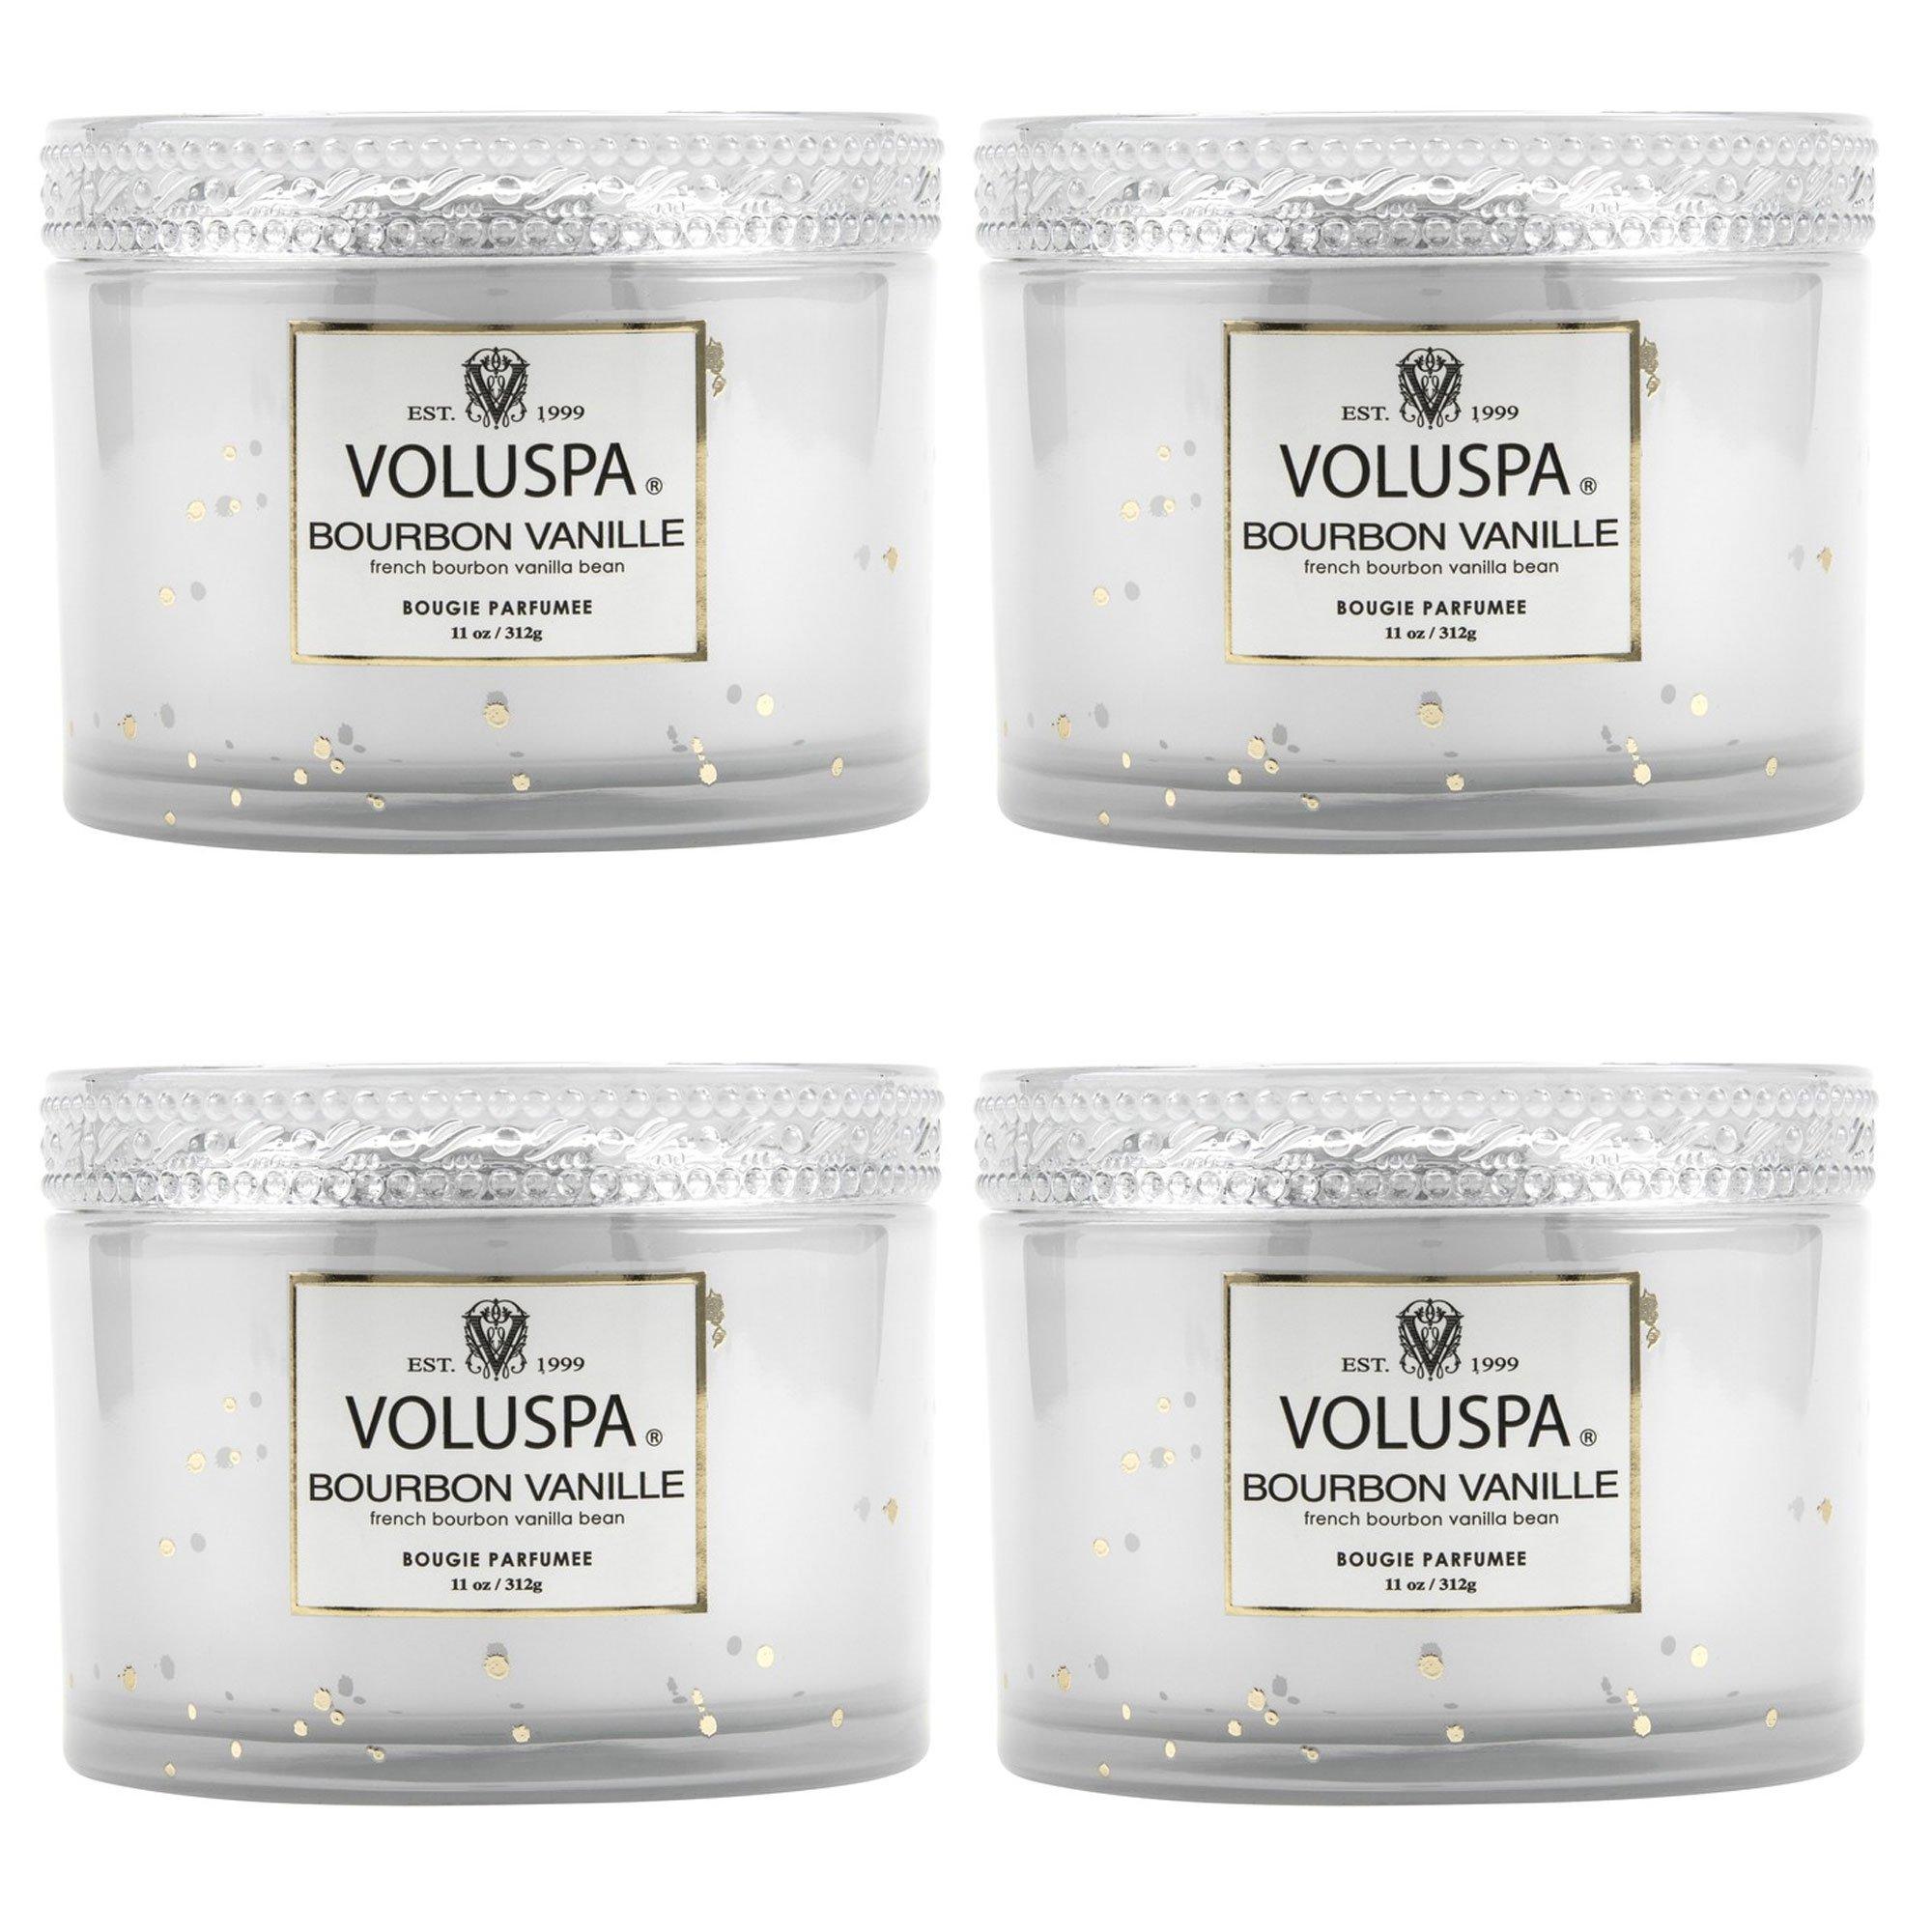 Voluspa Bourbon Vanille Corta Maison Candle 11 oz (4 pack)